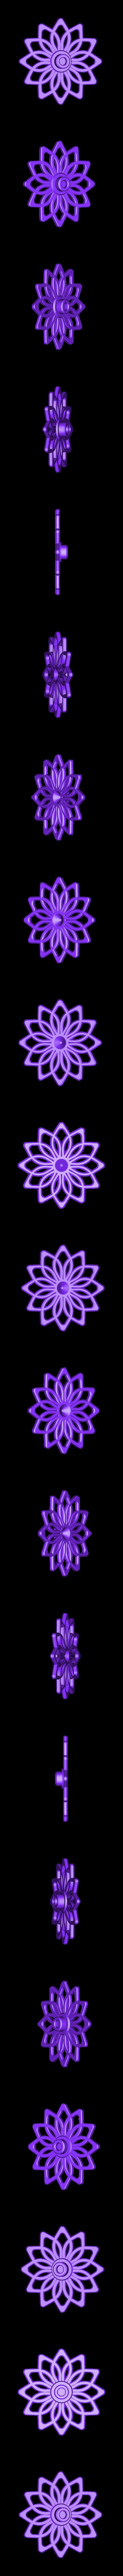 Flower_Cap2.stl Download free STL file Flower Hand Spinner 2 • 3D printable model, 87squirrels